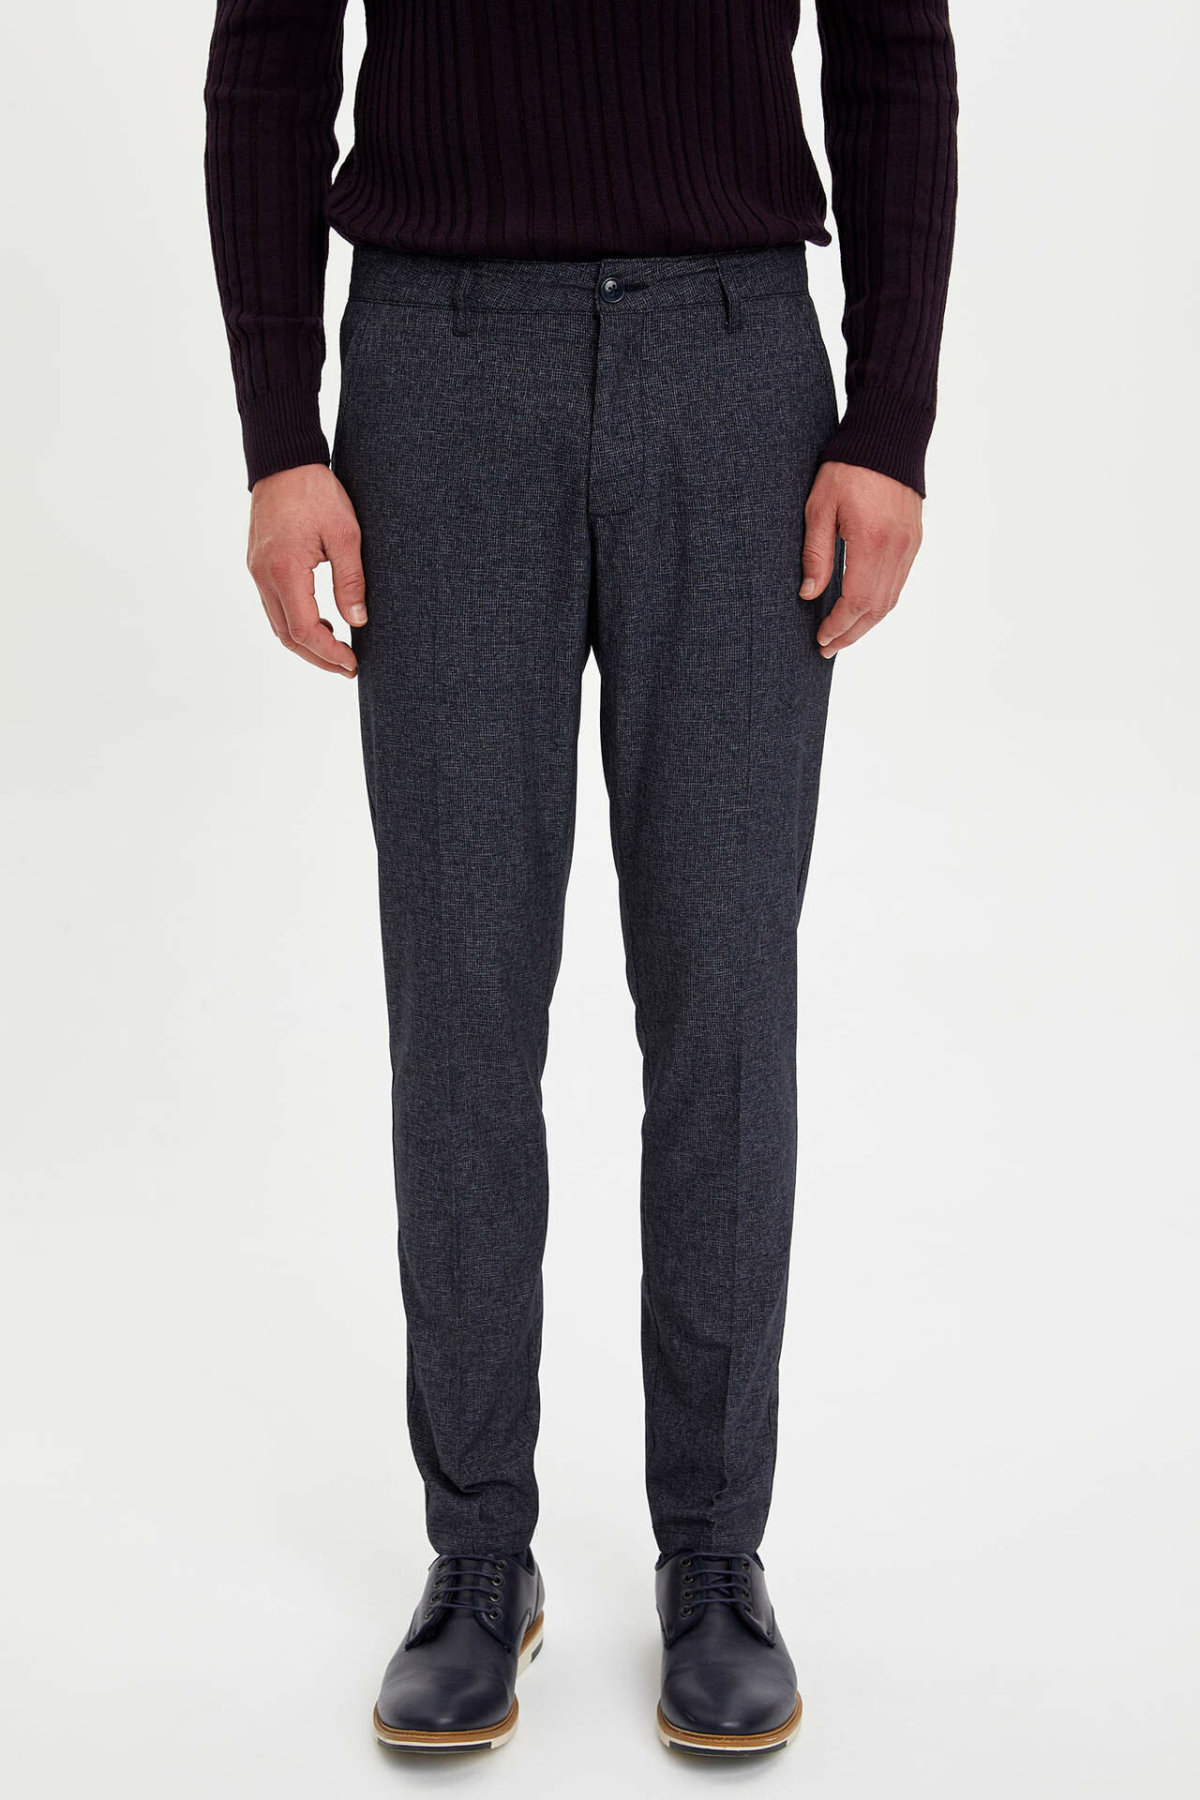 DeFacto Man Winter Thick Black Long Pants Men Smart Casual Pants Male Straight Bottoms Trousers-M2350AZ19WN